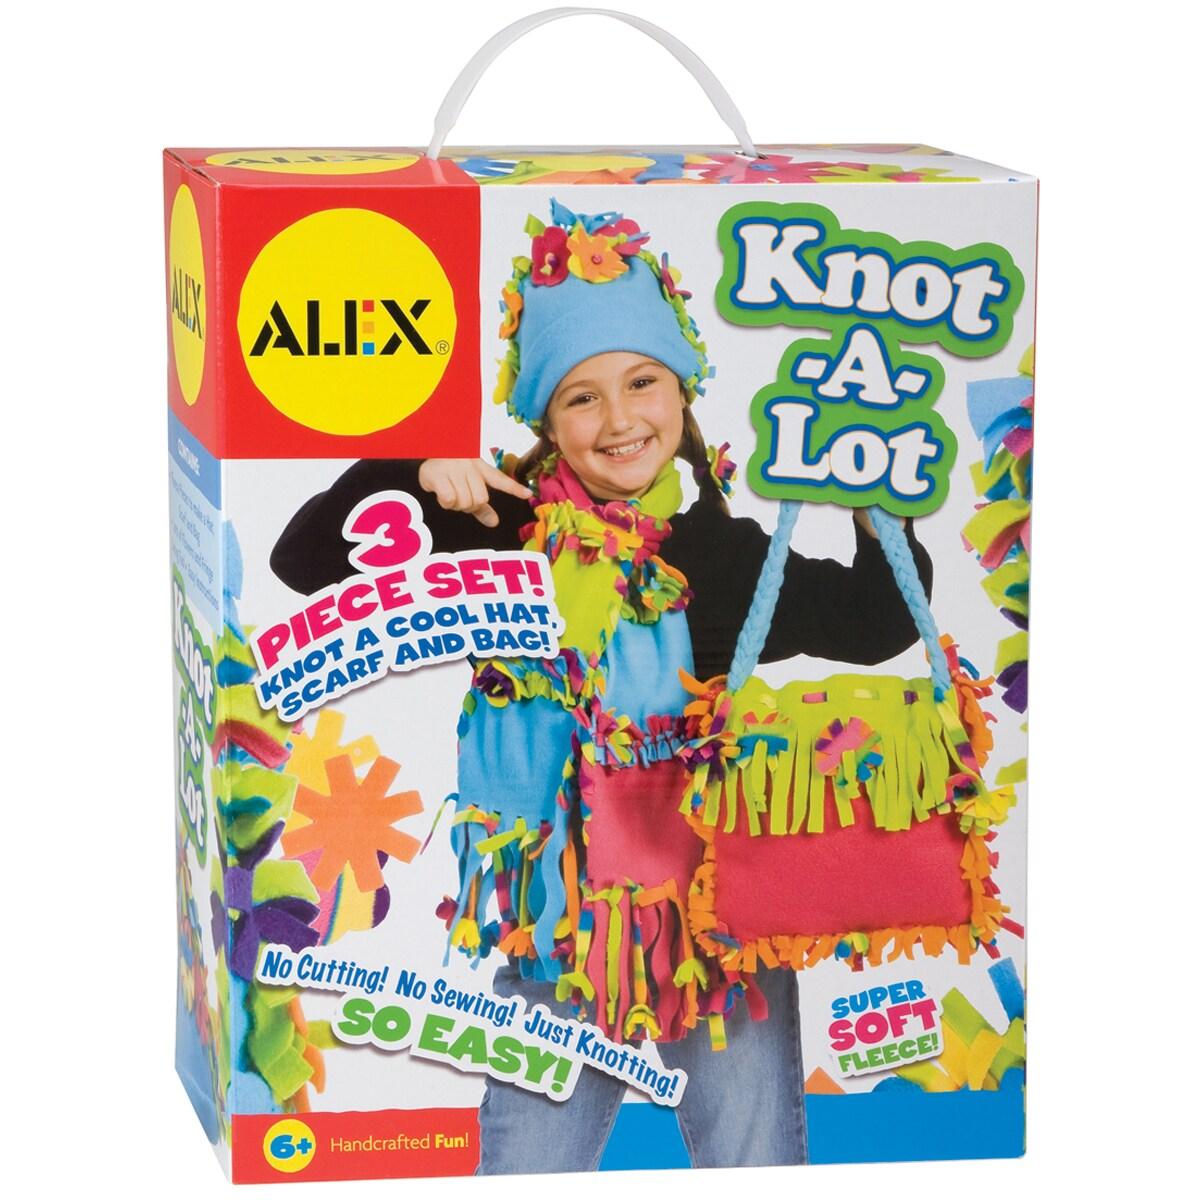 Alex Toys Knot-A-Lot Kit at Sears.com